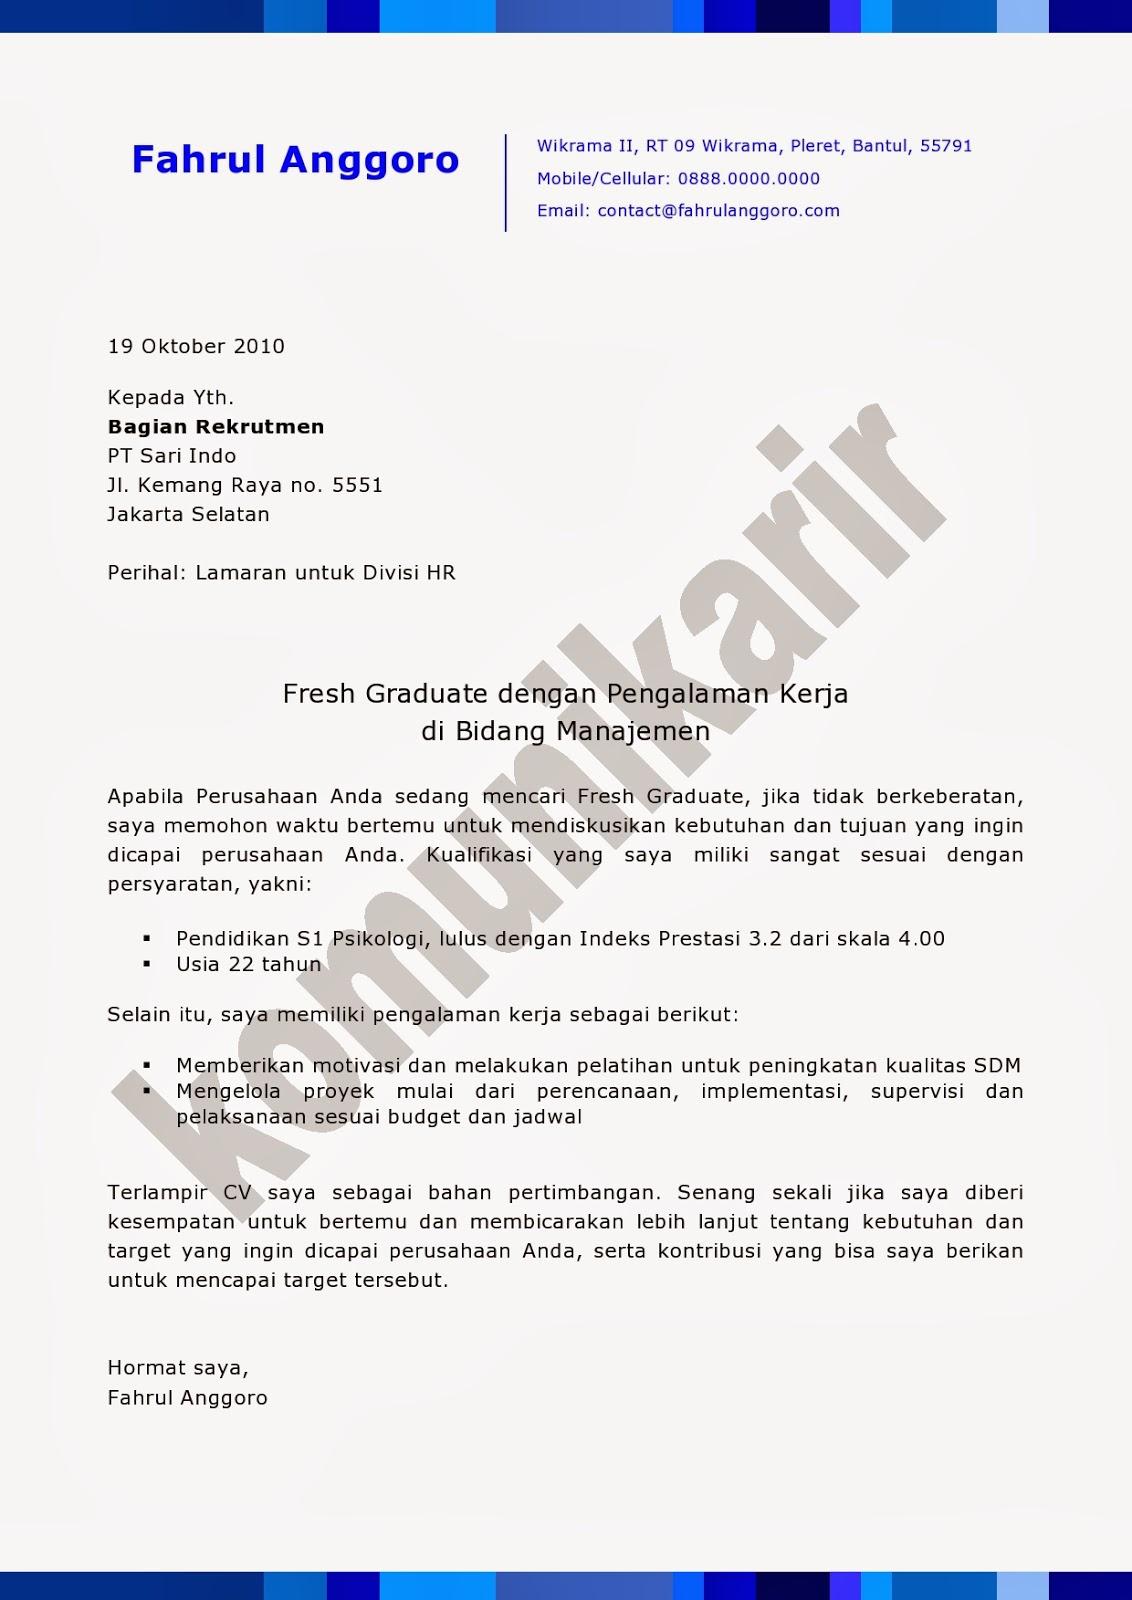 Contoh Proposal Business Plan Bidang Jasa - Wall PPX